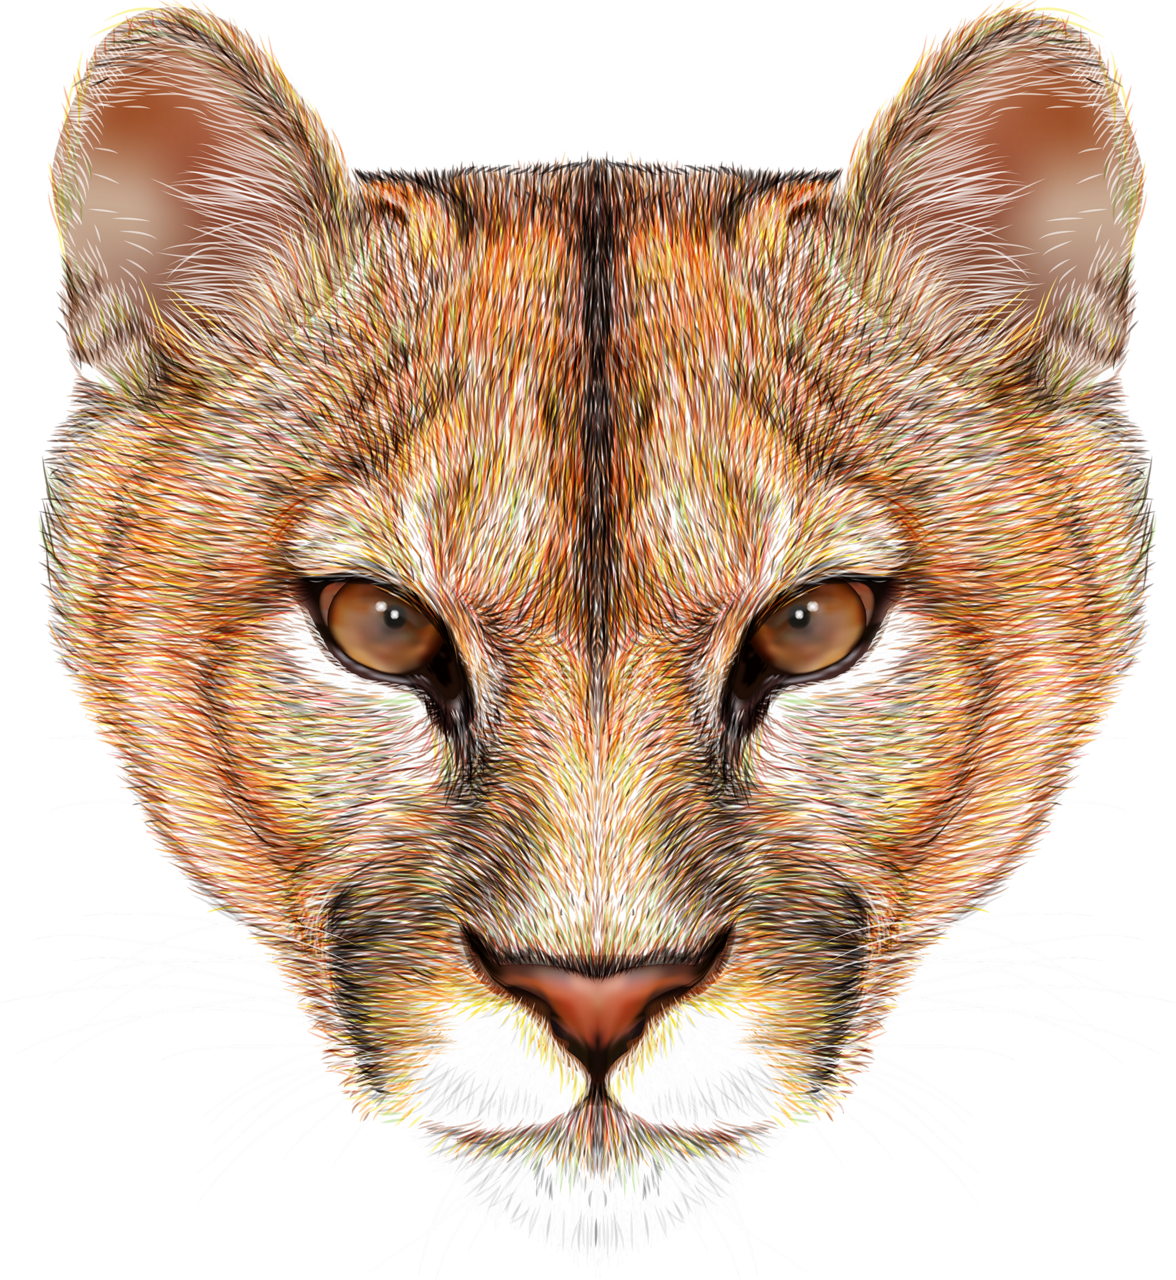 Mountain cat clipart transparent library Mountain lion head background vector [преобразованный].png ... transparent library